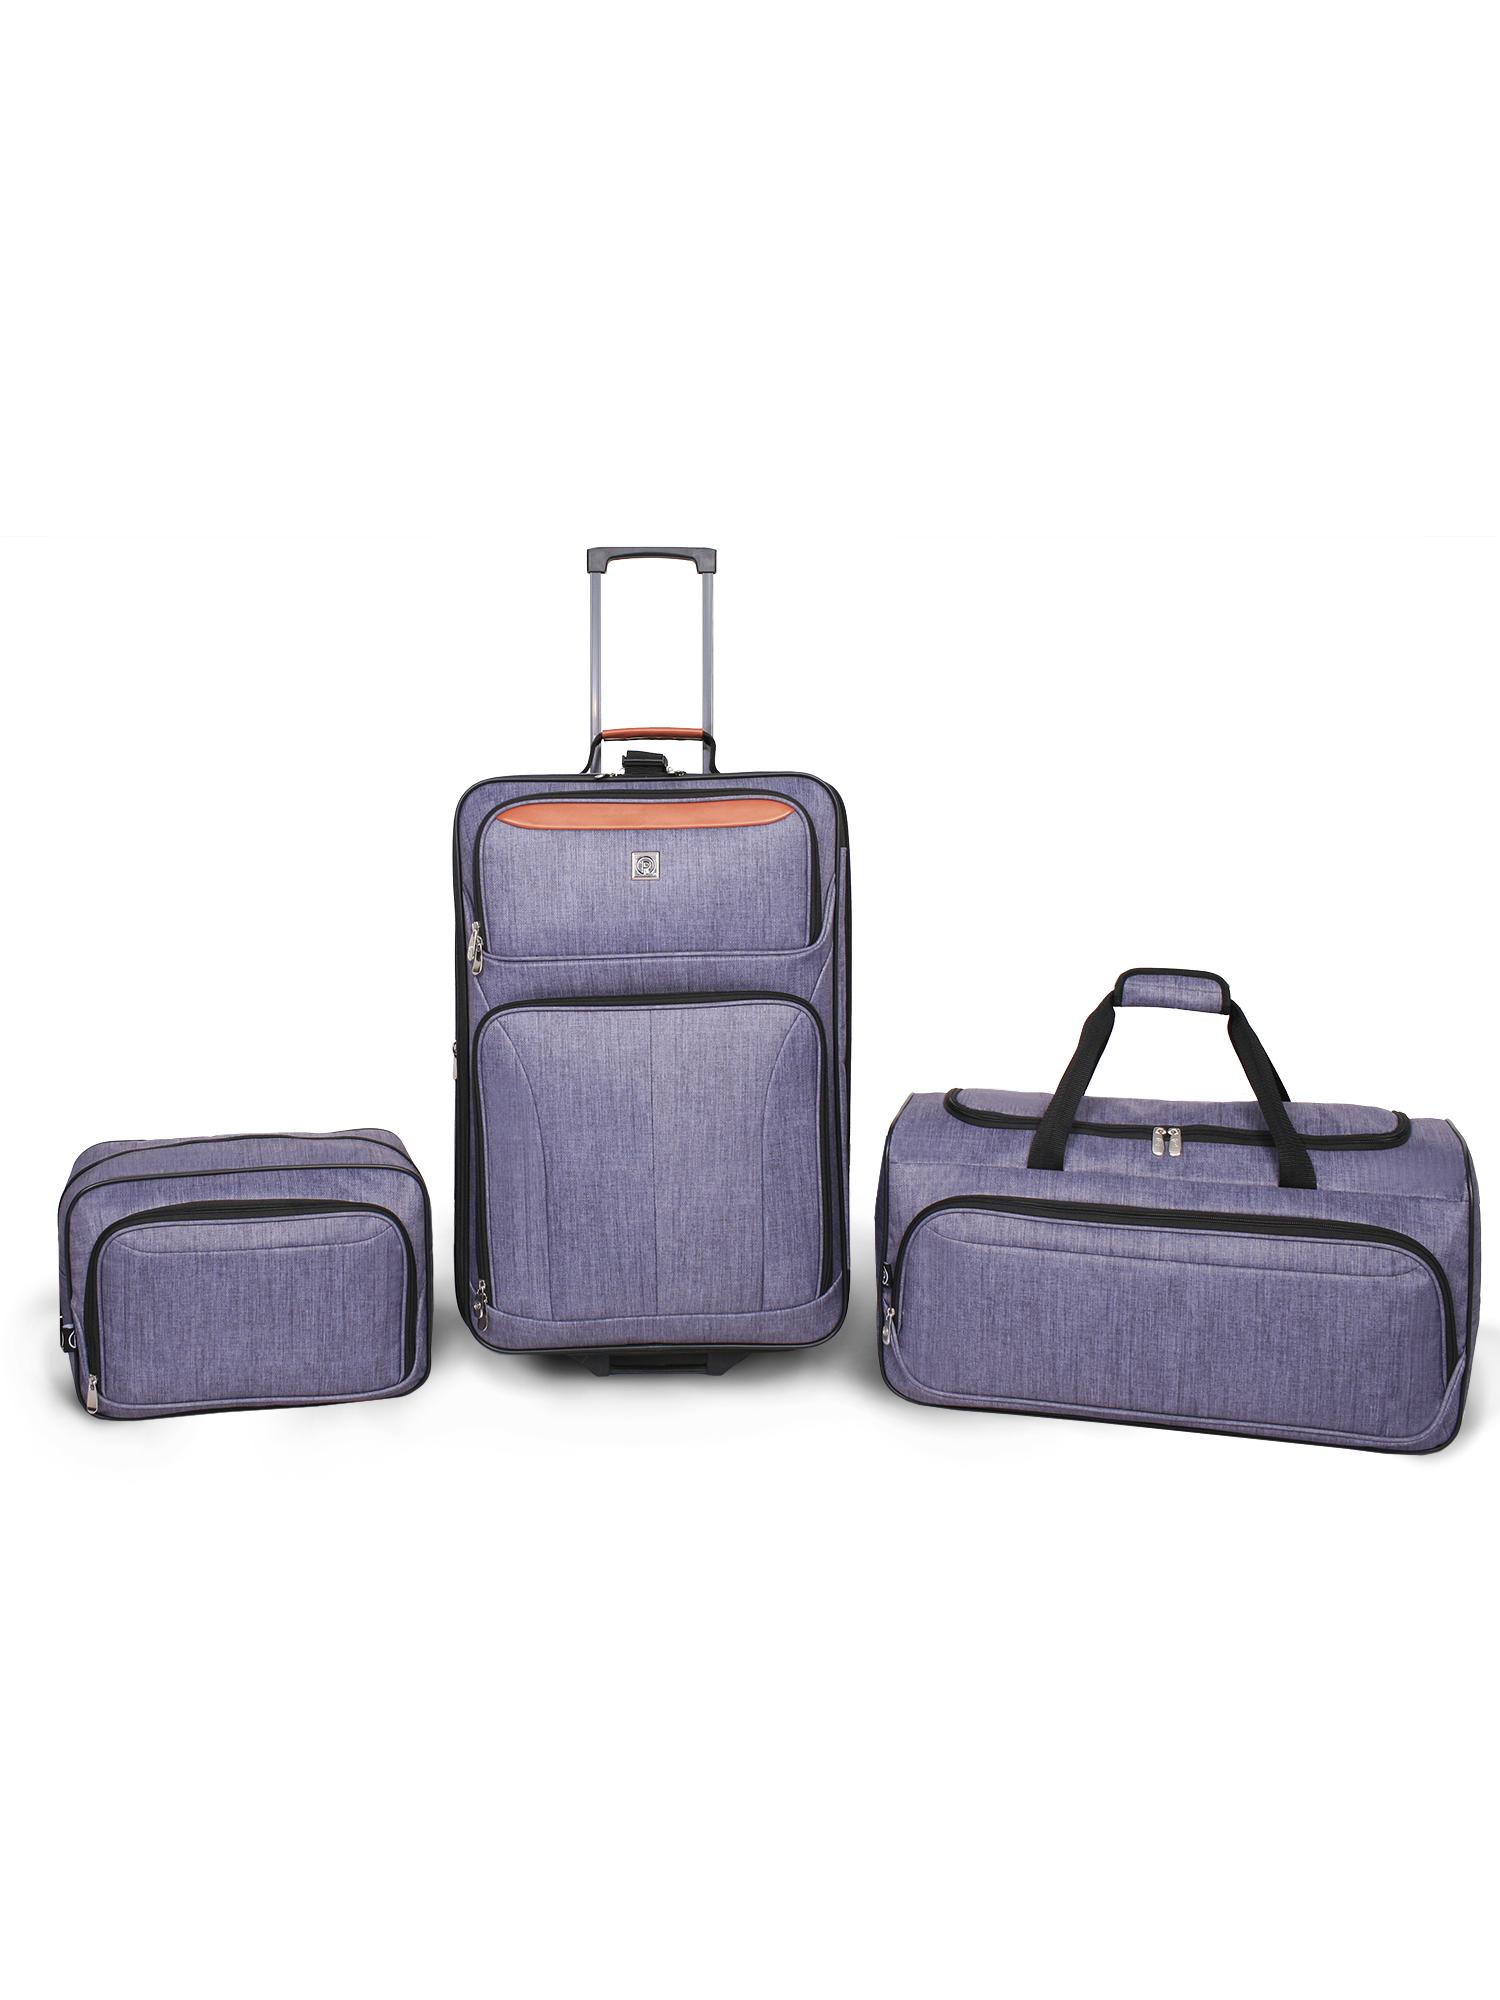 Protege 3 Piece Luggage Set (Gray)